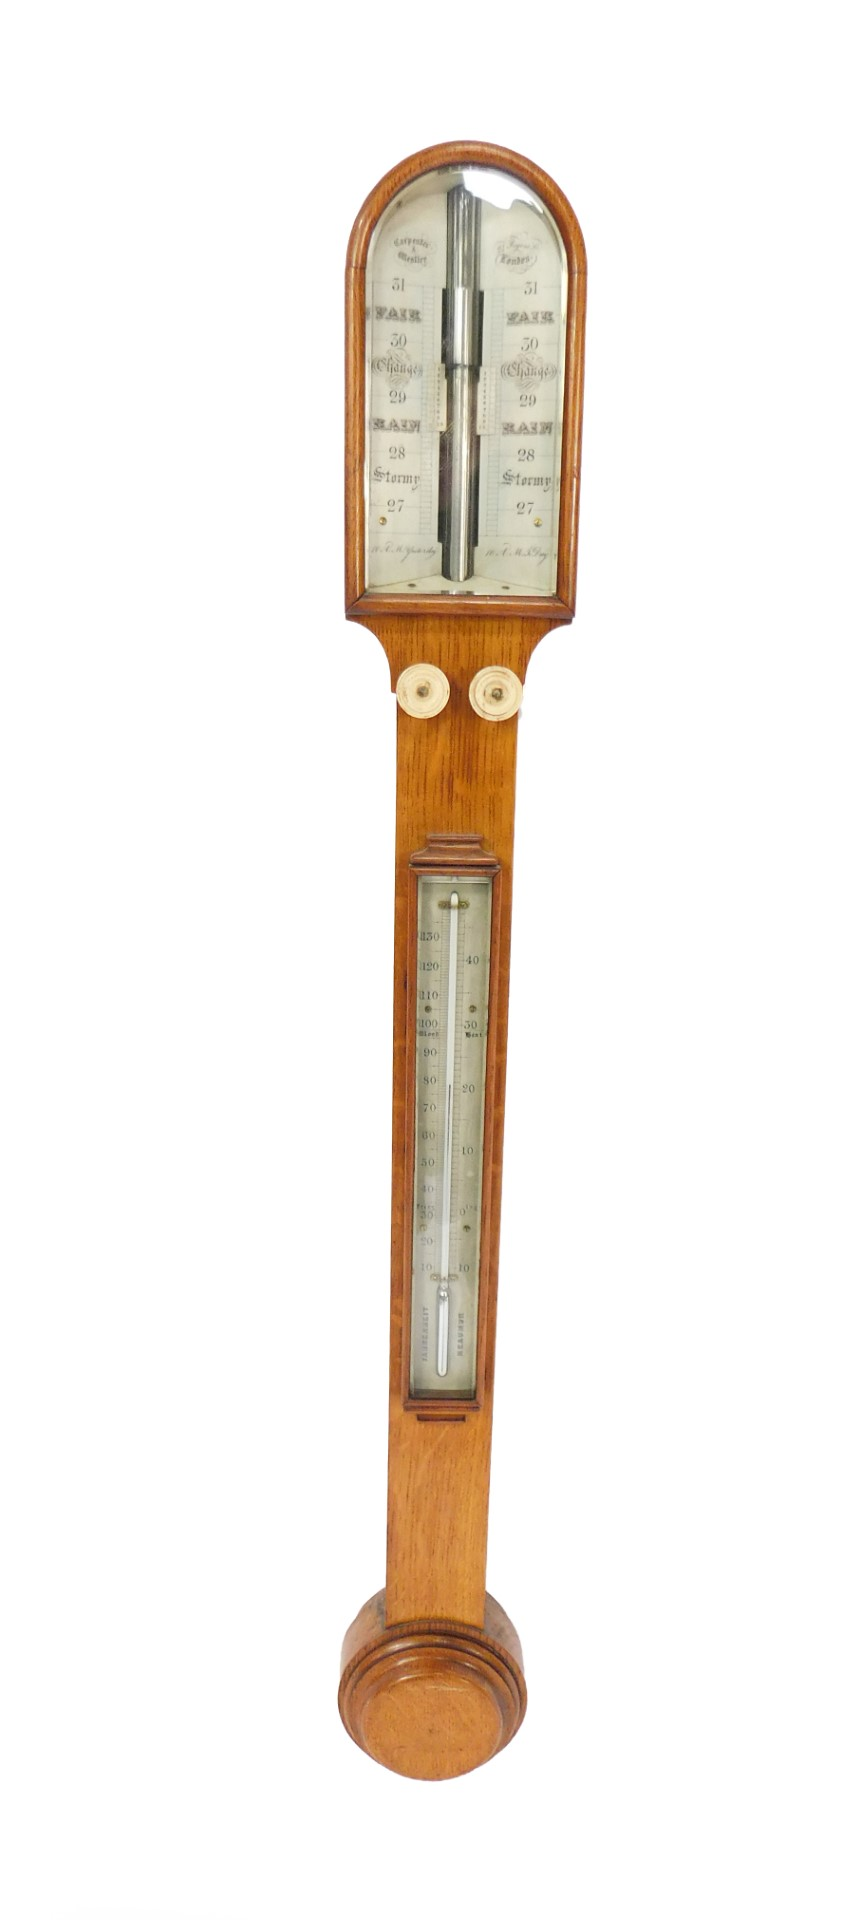 Lot 12 - A Victorian oak cased stick barometer by Carpenter & Westley, 24 Regent Street London, with